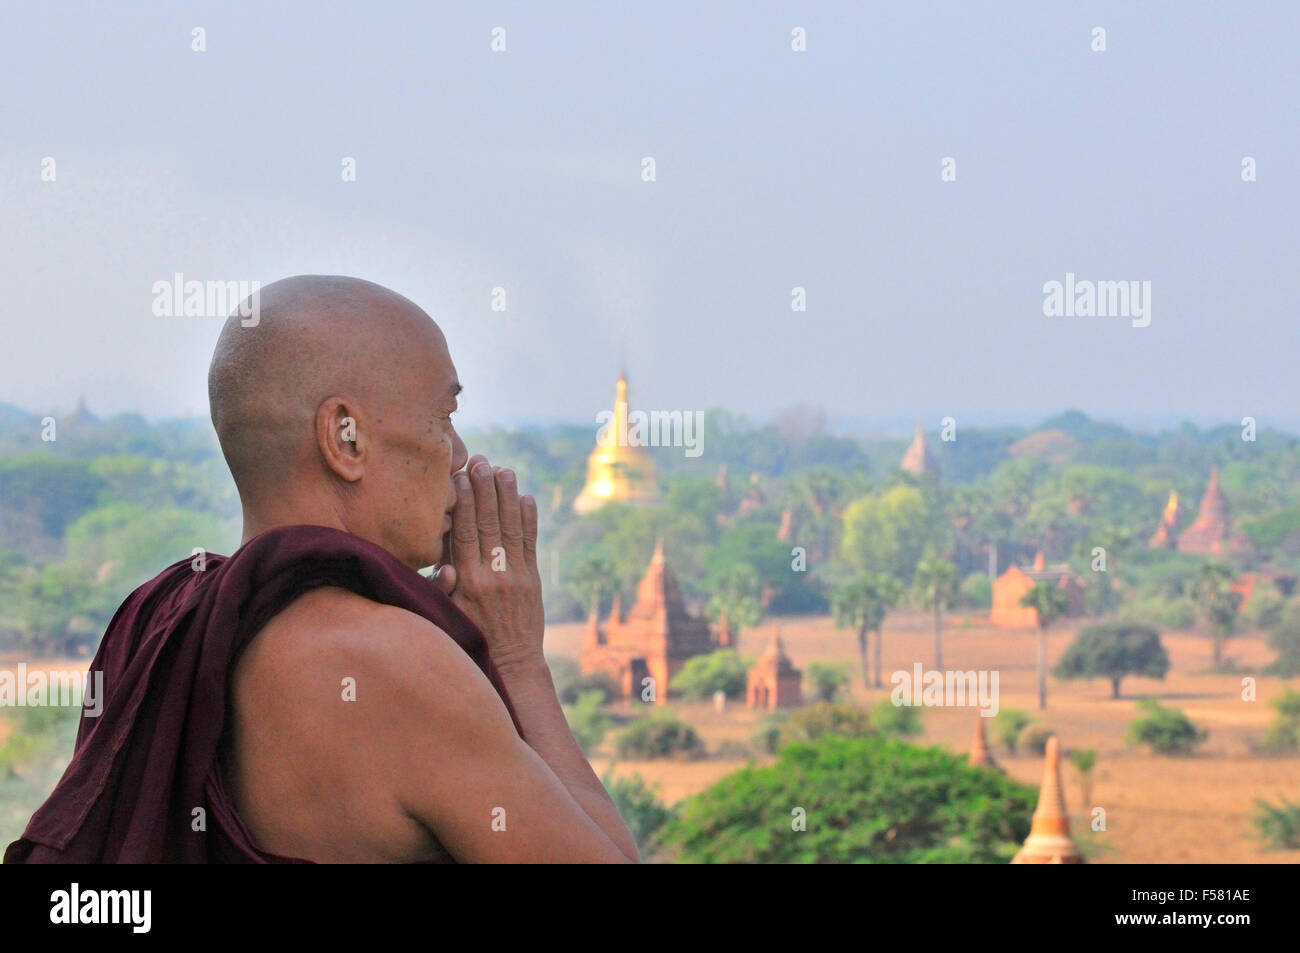 Monje budista rezando en la parte superior de la Pagoda Shwesandaw en Bagan, Birmania (Myanmar) Foto de stock